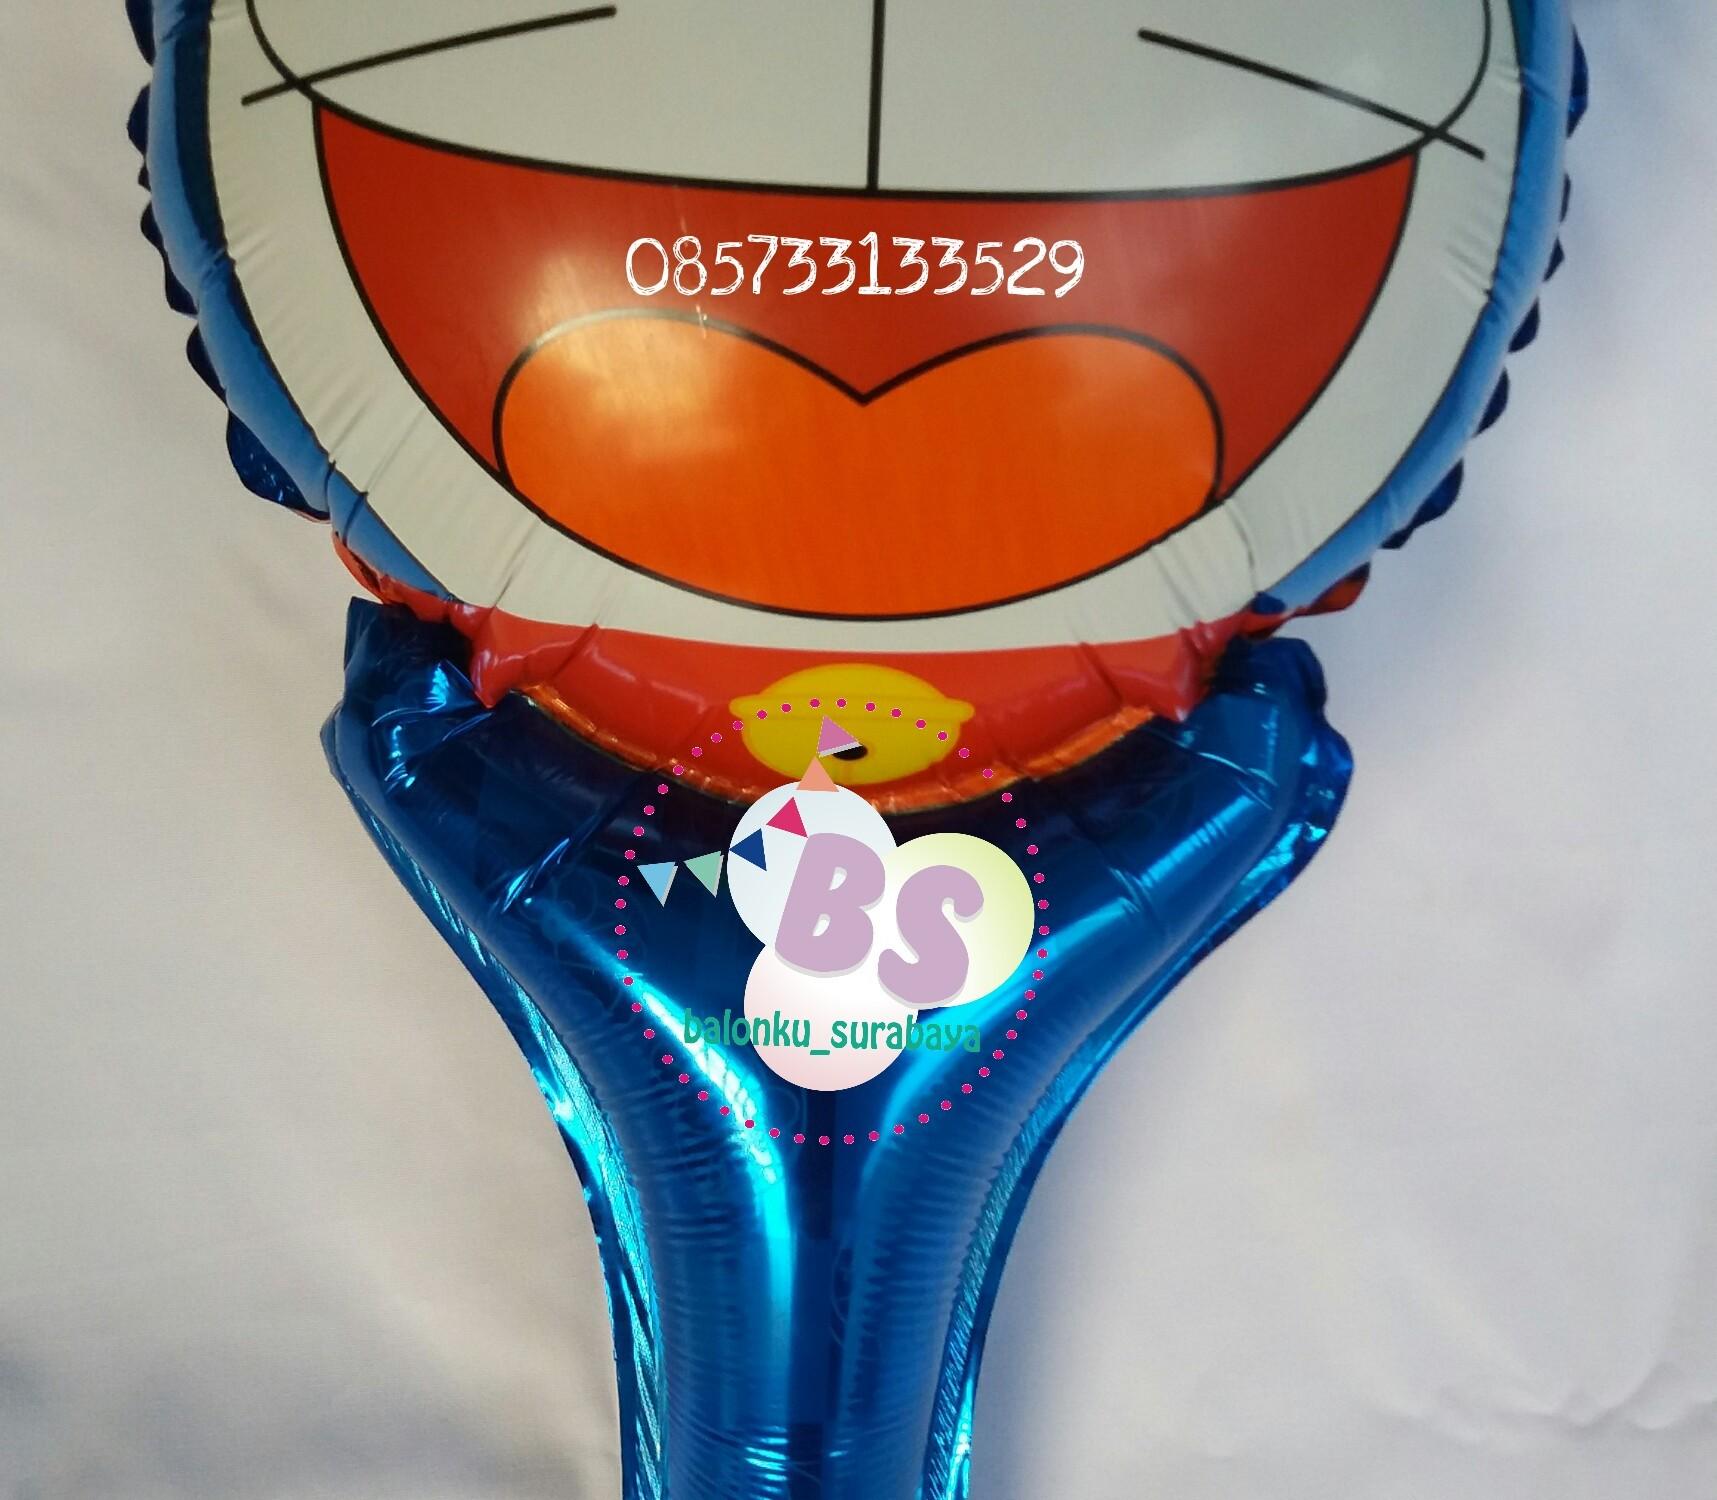 balon doraemon, balon doff, balon latex doff, balon ulang tahun, balon dekorasi, balon foil, balon metalik, balon twist, balon latex, balon huruf, balon angka, supplier balon, dekorasi balon, sablon balon, confetti, bendera ulang tahun, balon LED, lampion terbang